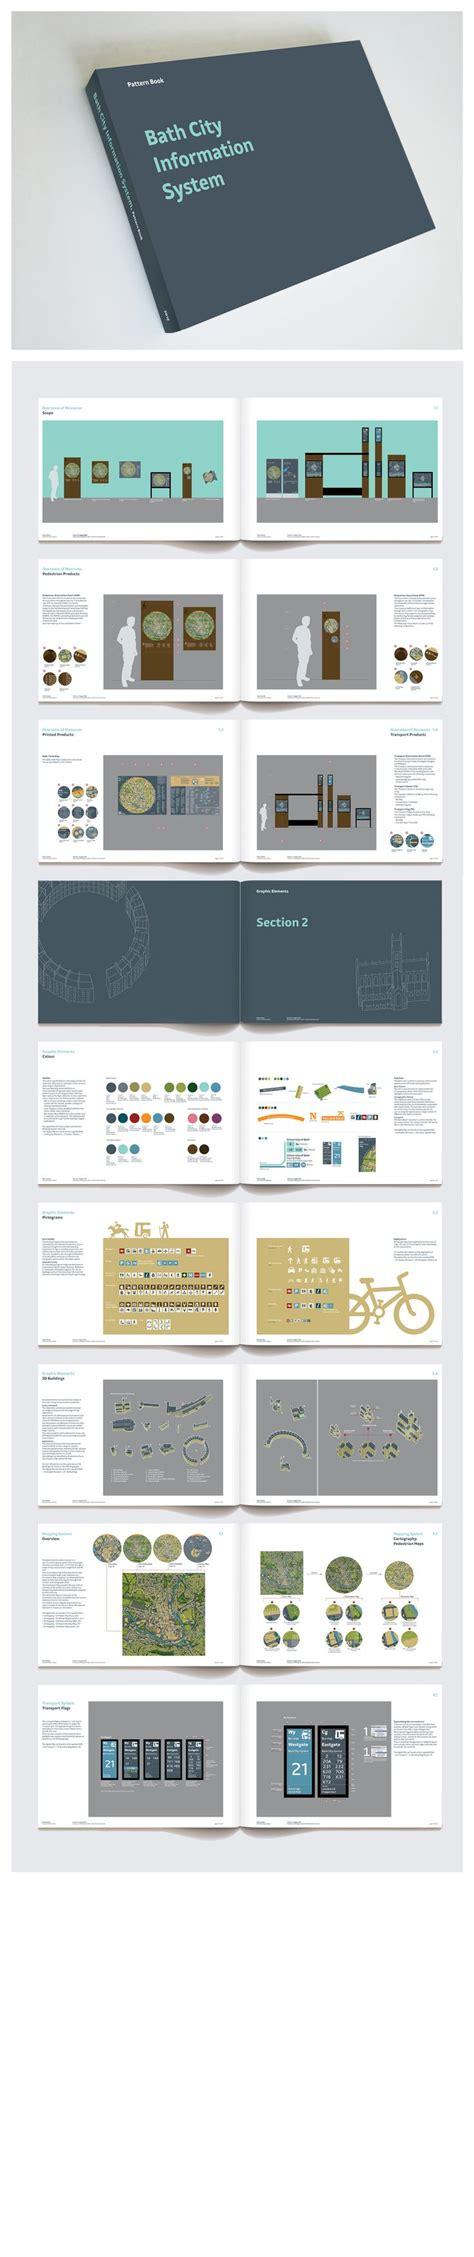 design pattern guidelines best 25 wayfinding signage ideas on pinterest signage